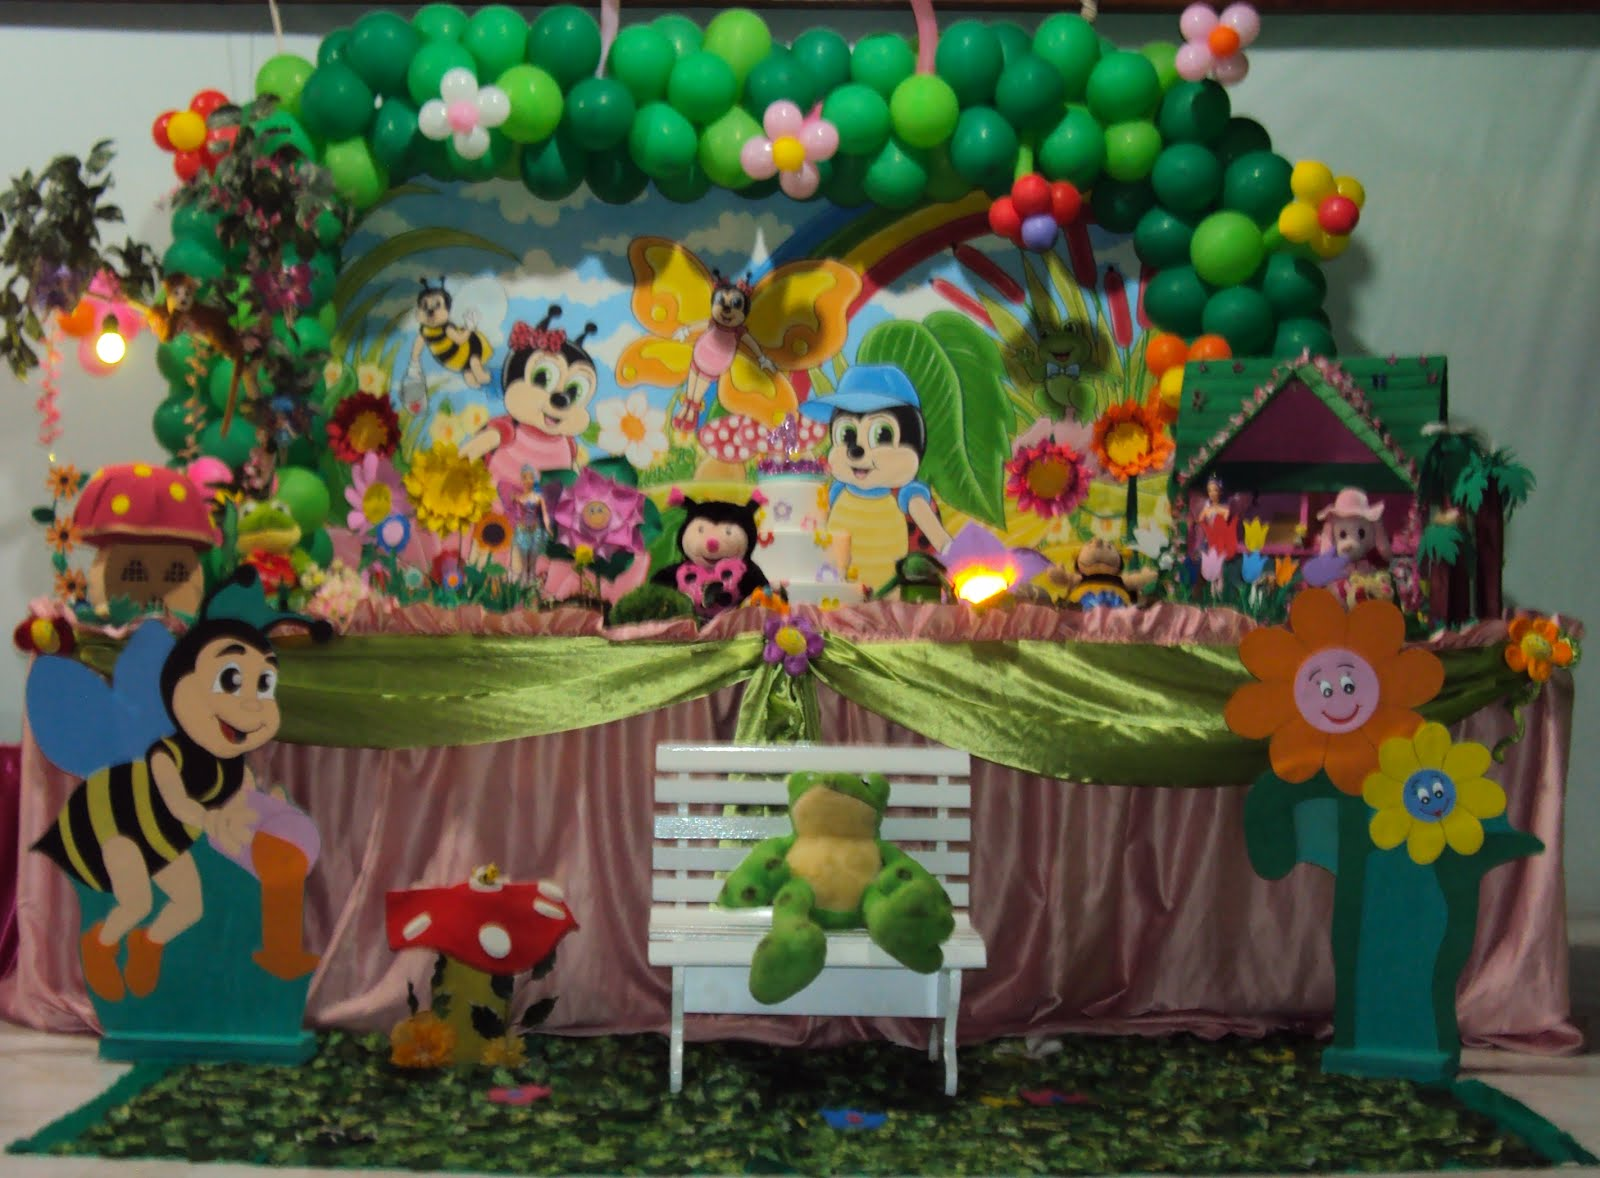 decoracao de festa infantil tema jardim:Sirlei Festas infantil-Rua:Oreade 174 Moreninha III Tel:(67)3393-2873